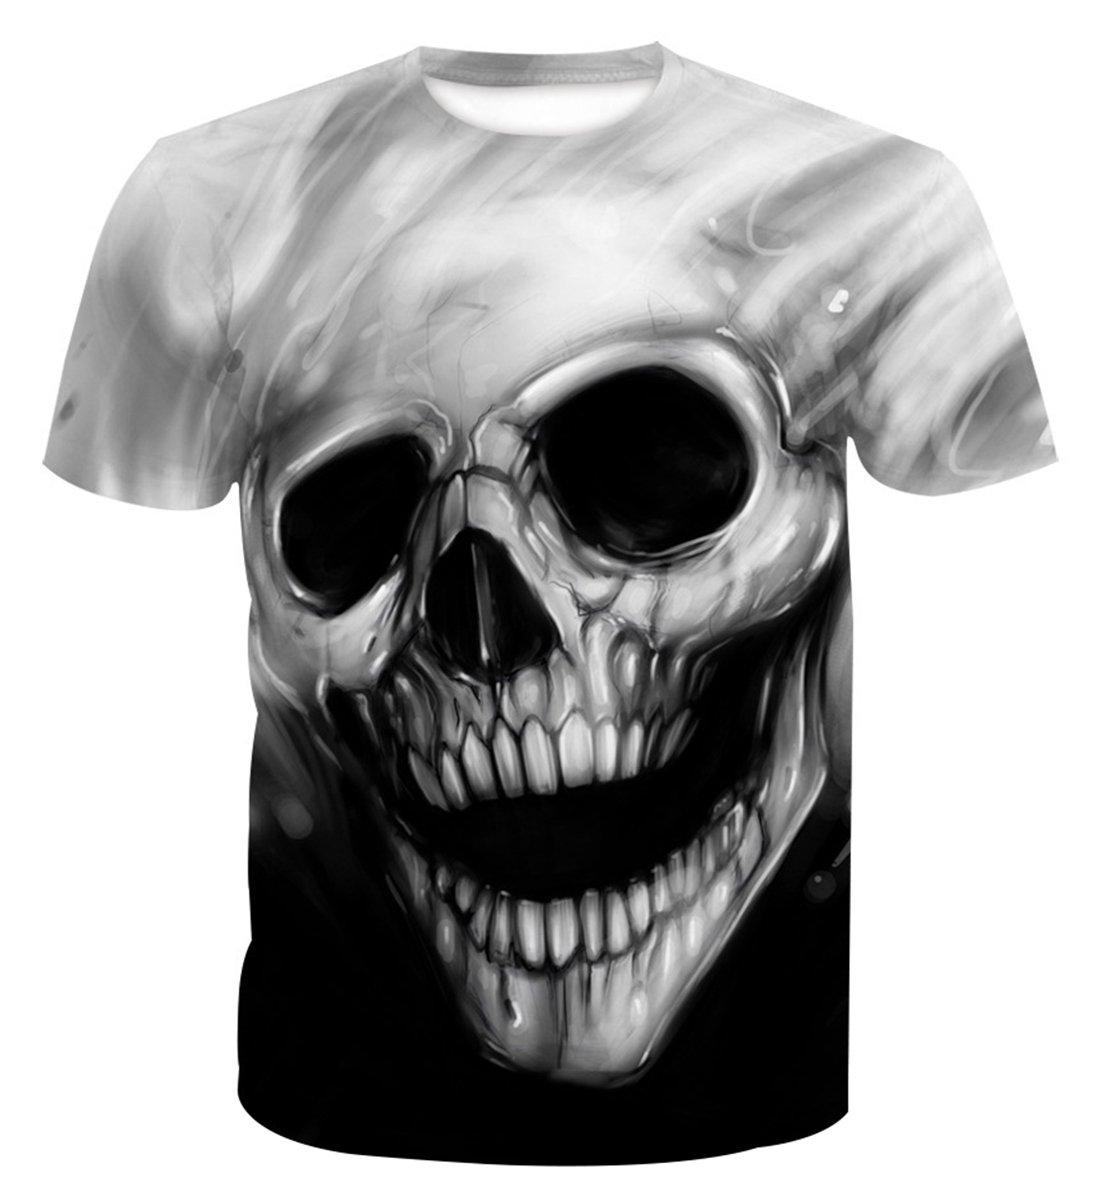 AIEOE Mens Womens 3D Printed Short Sleeve Summer Casual Cool T-Shirts Fashion Couple Top Tees Grey Skull 3XL